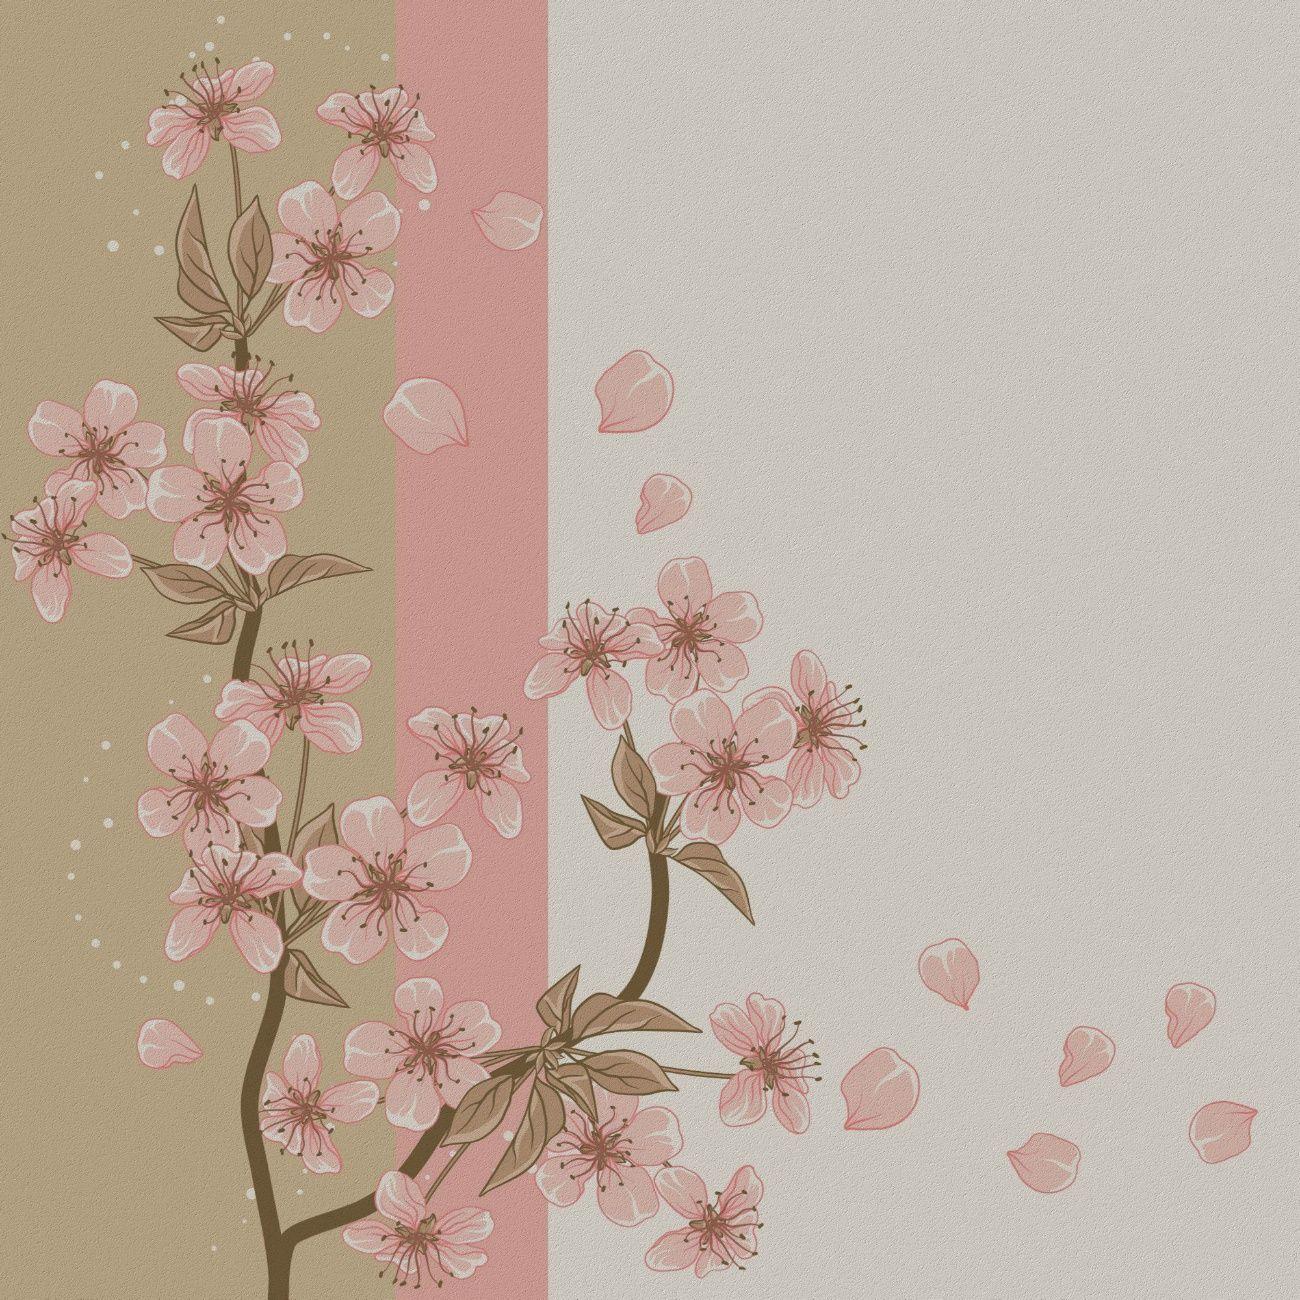 background for scrapbooking ackgrounds and patterns pinterest papier fleurs et toutes. Black Bedroom Furniture Sets. Home Design Ideas